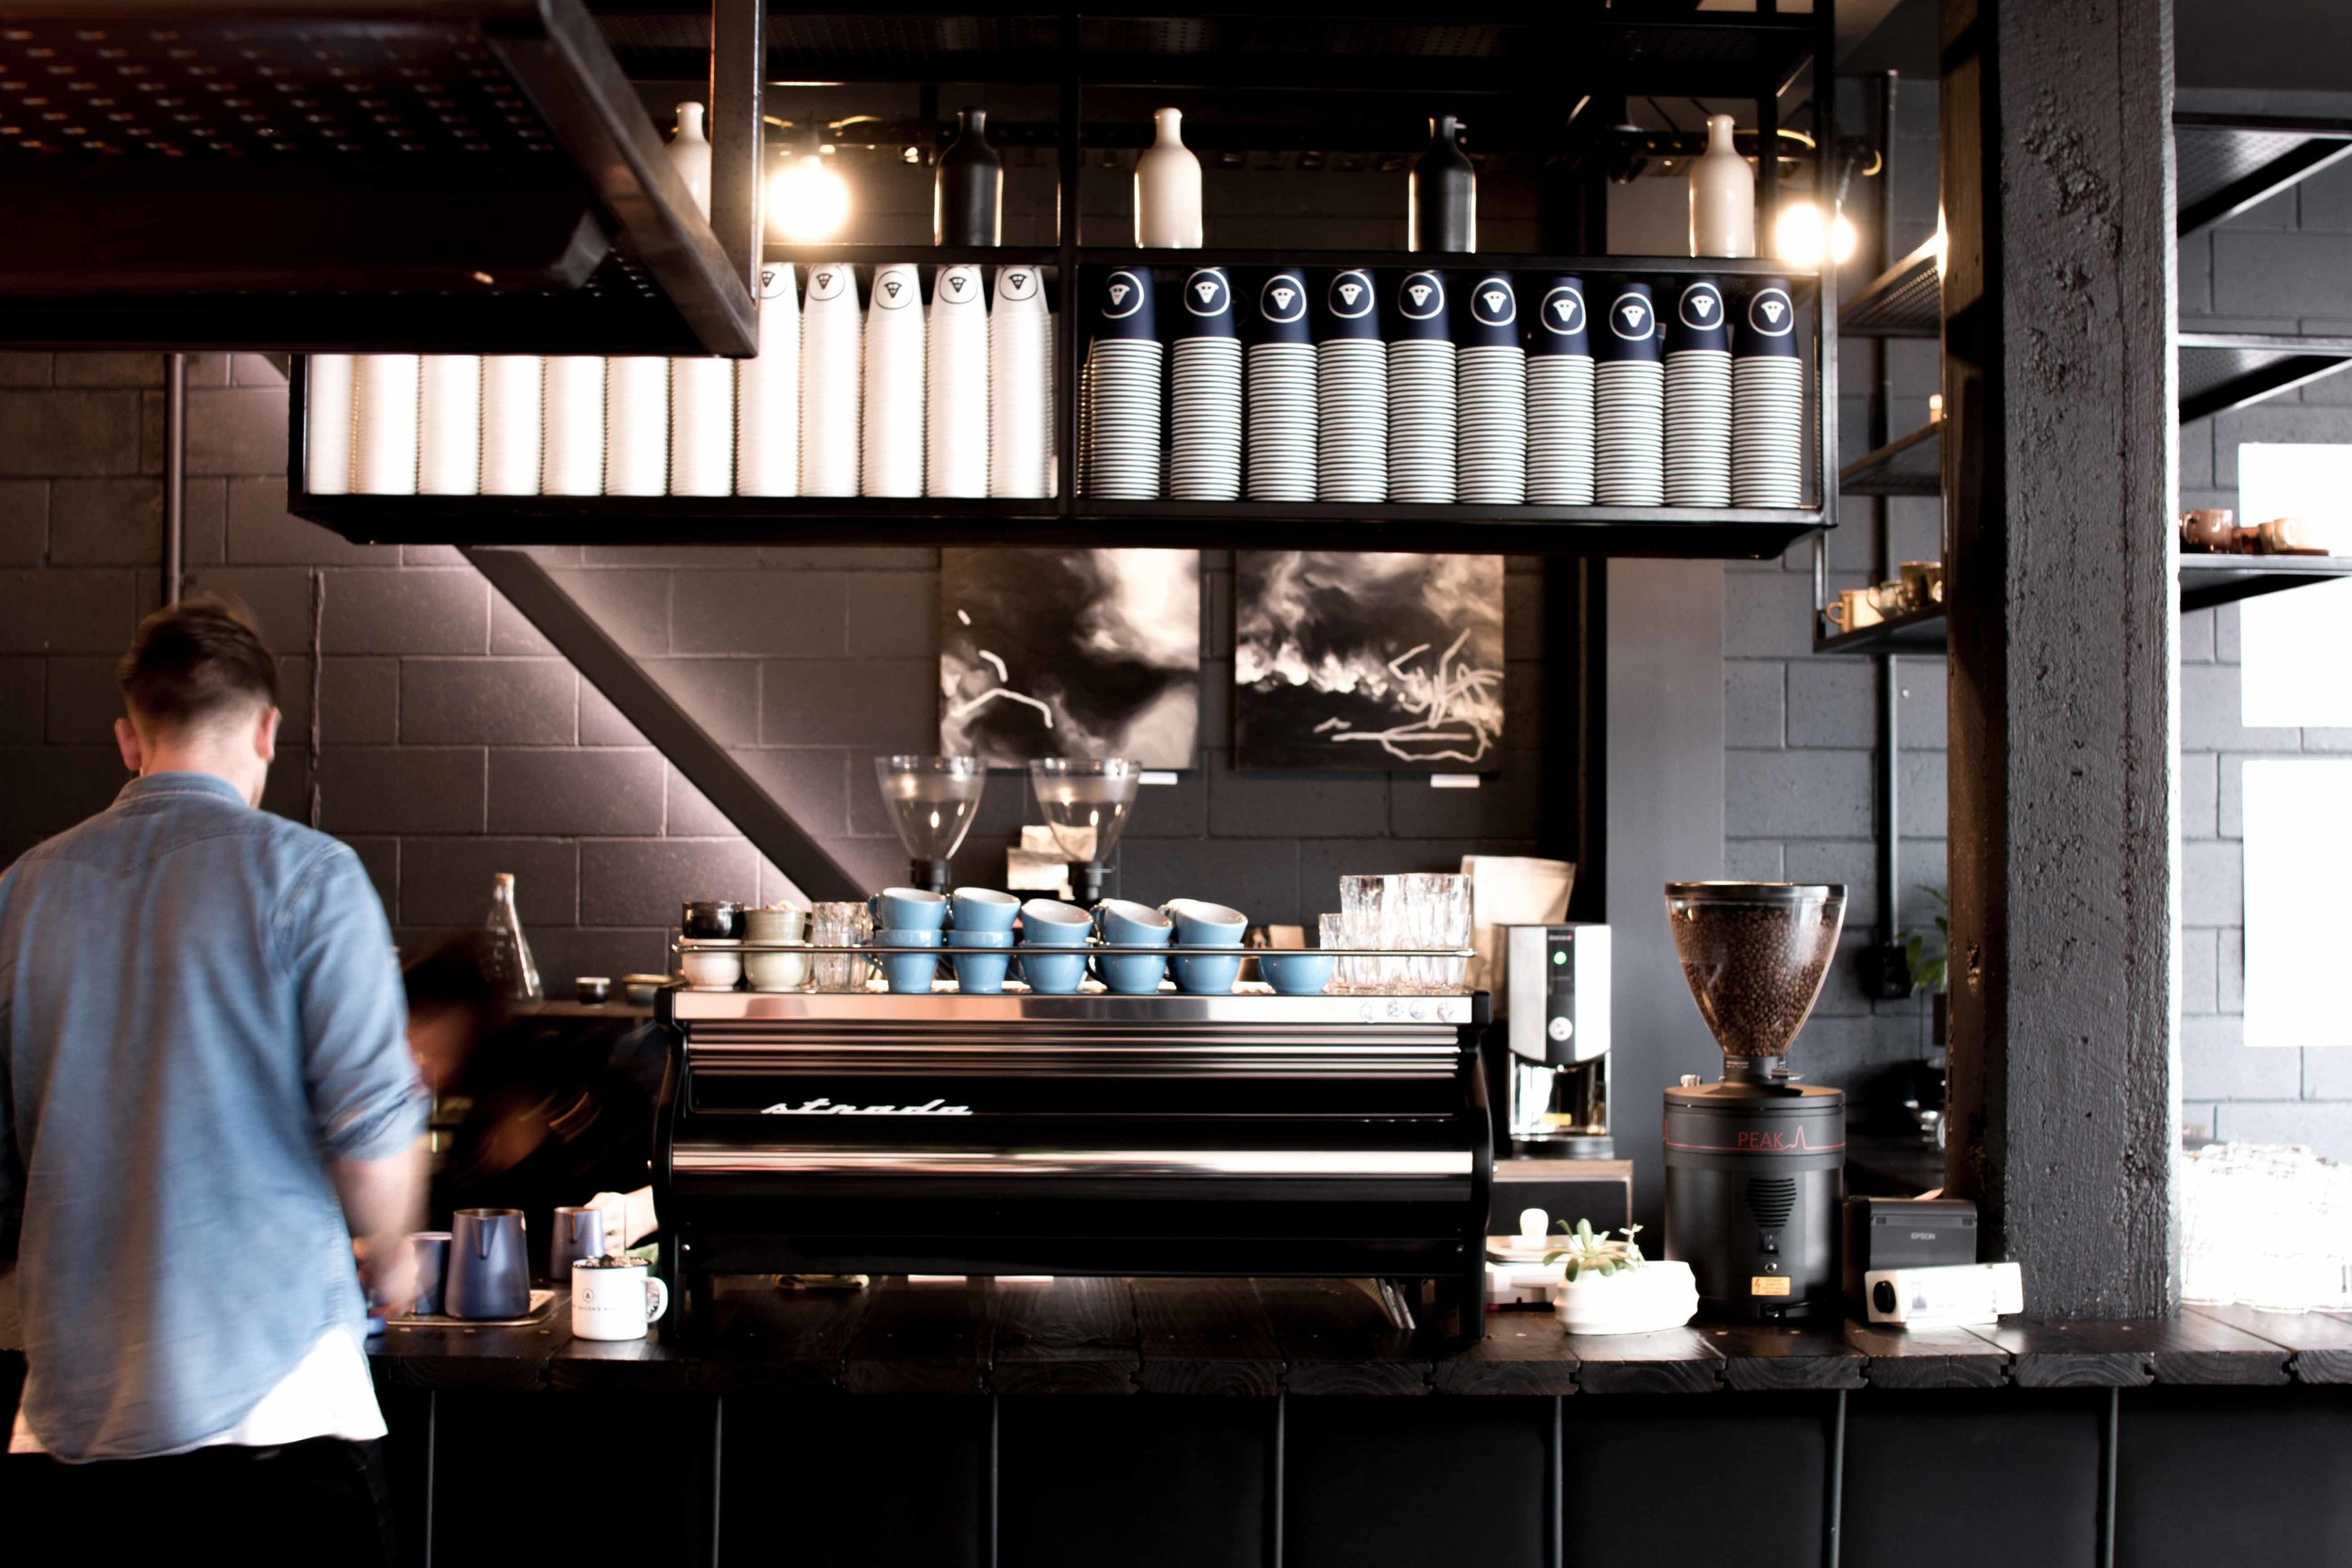 coffee-machine-1-low.jpg